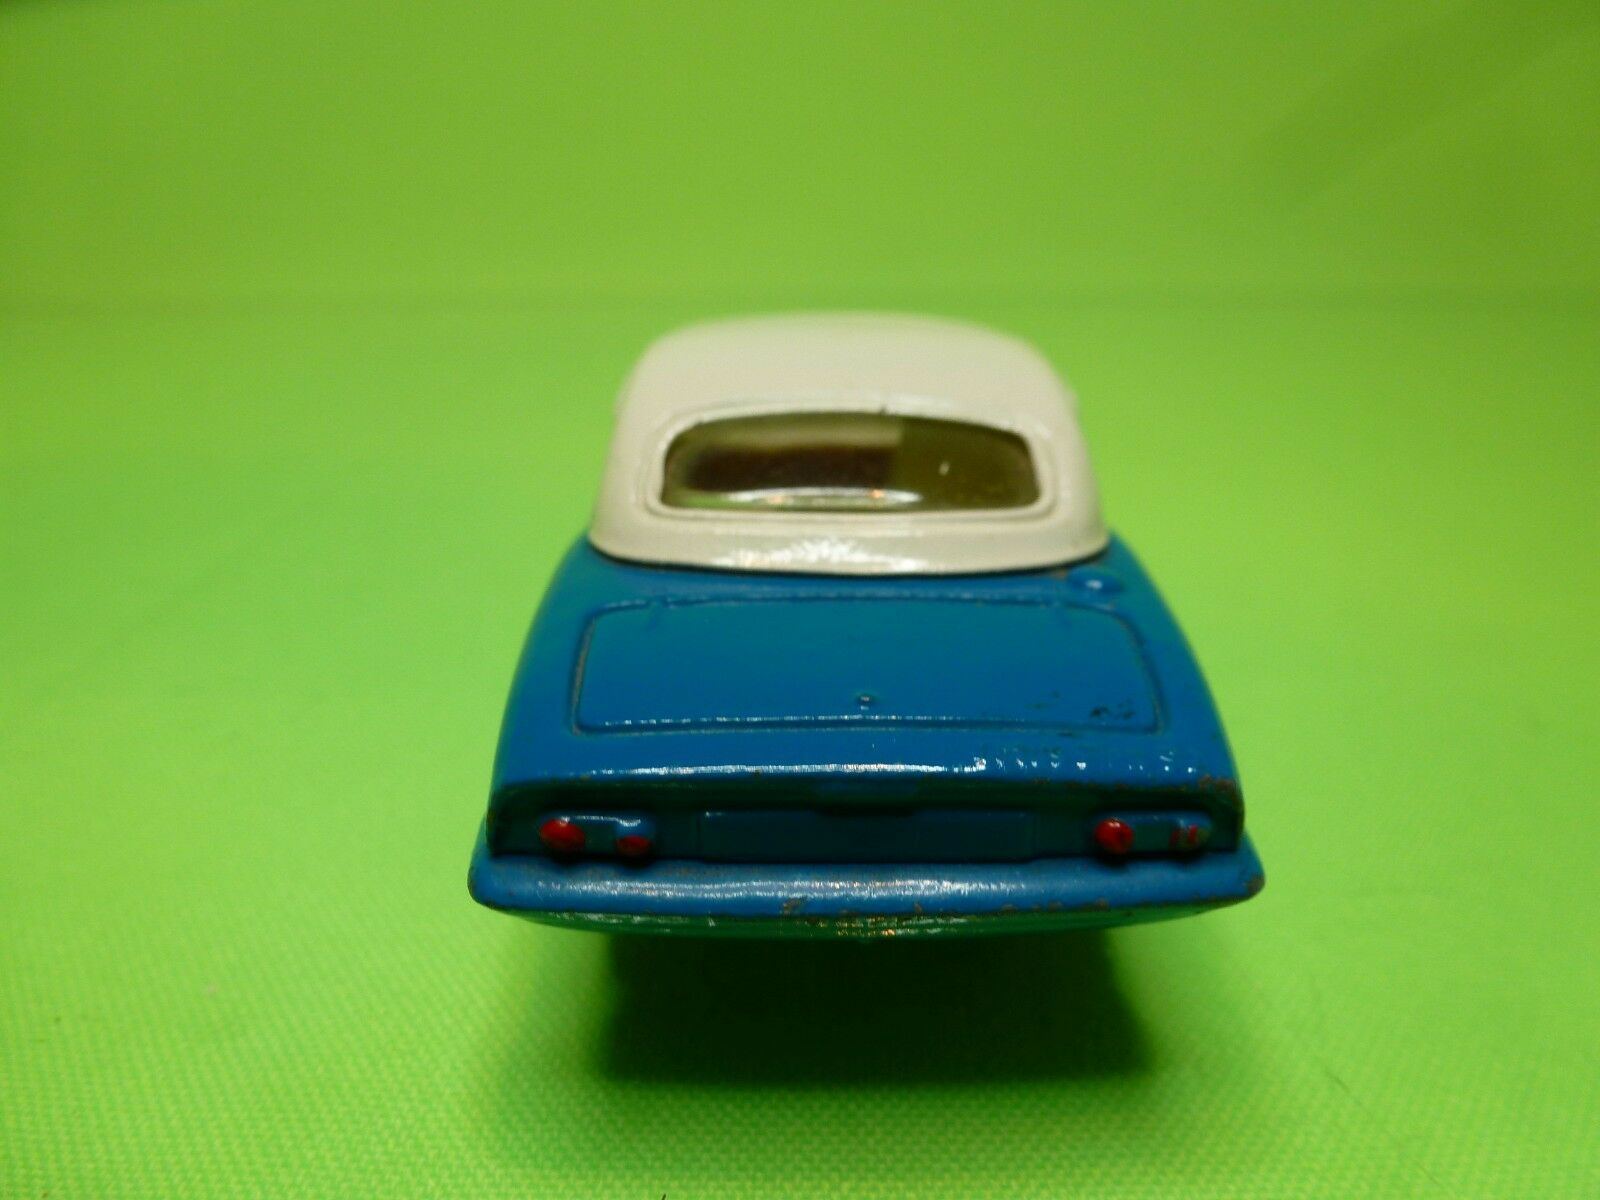 CORGI TOYS 319  LOTUS ELAN S2 - DETACHABLE CHASSIS CHASSIS CHASSIS - blu 1 43 - EXCELLENT 92e186